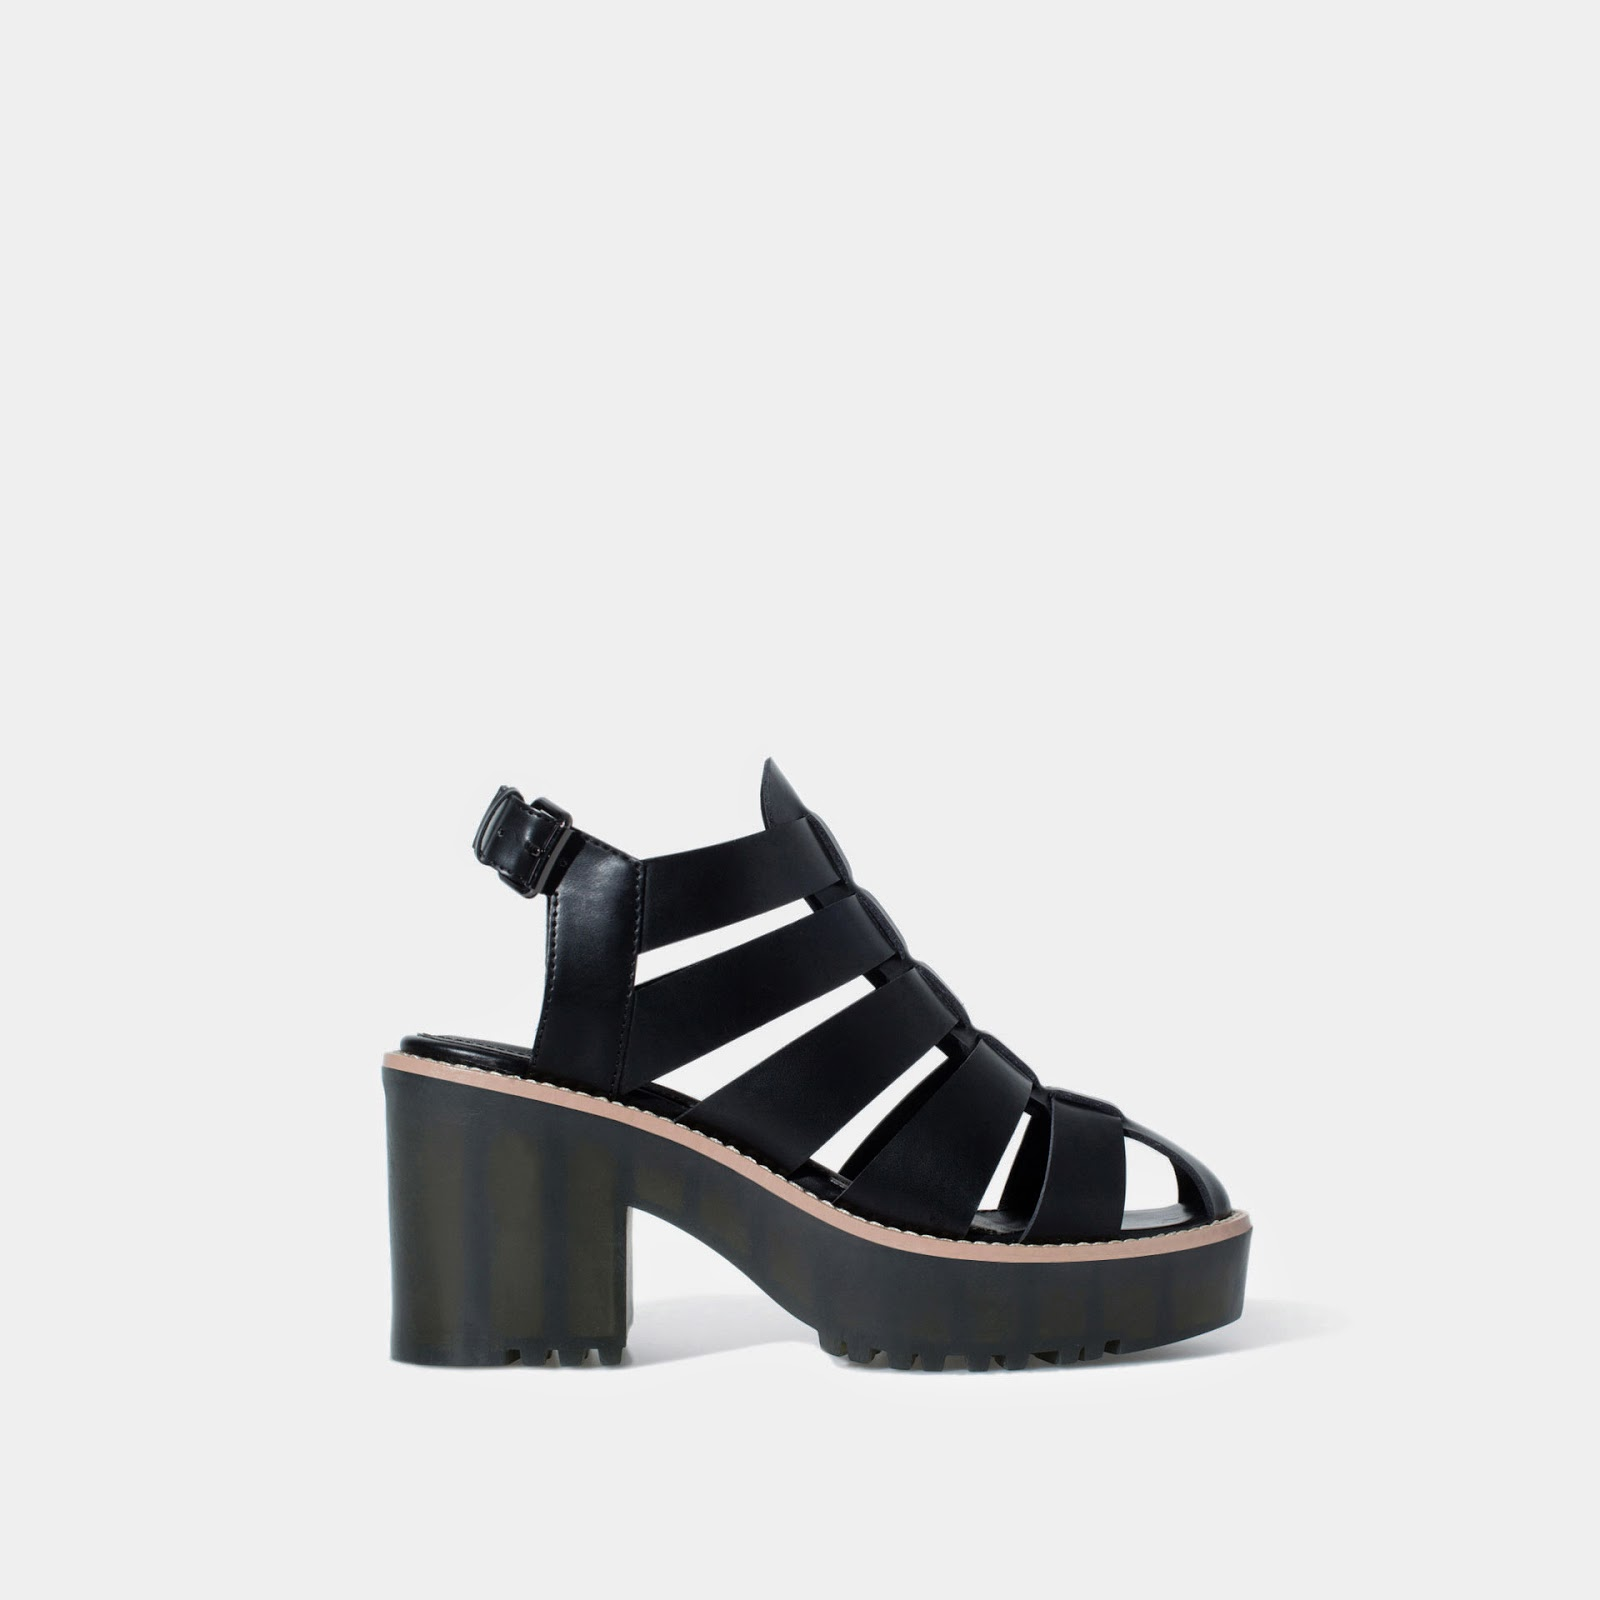 Cangrejera tacón, Zara, shoes, shoes adict